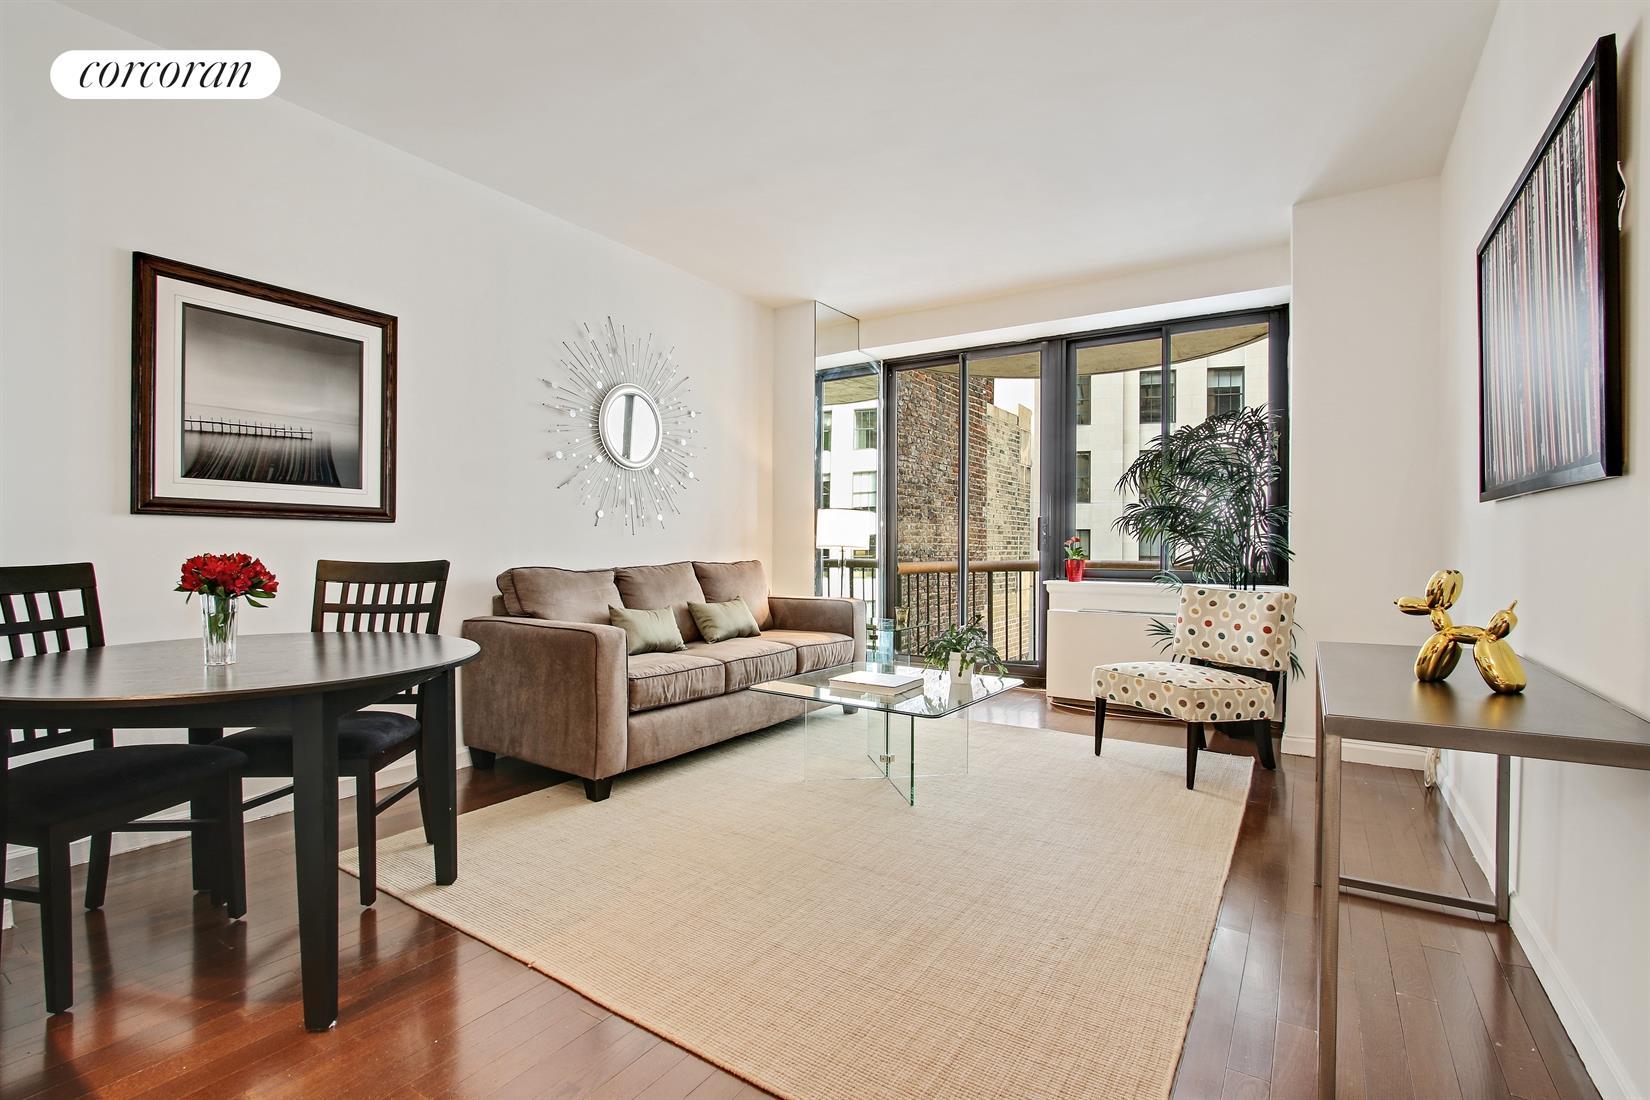 Corcoran, 45 East 25th Street, Apt. 23D, Flatiron Real Estate ...